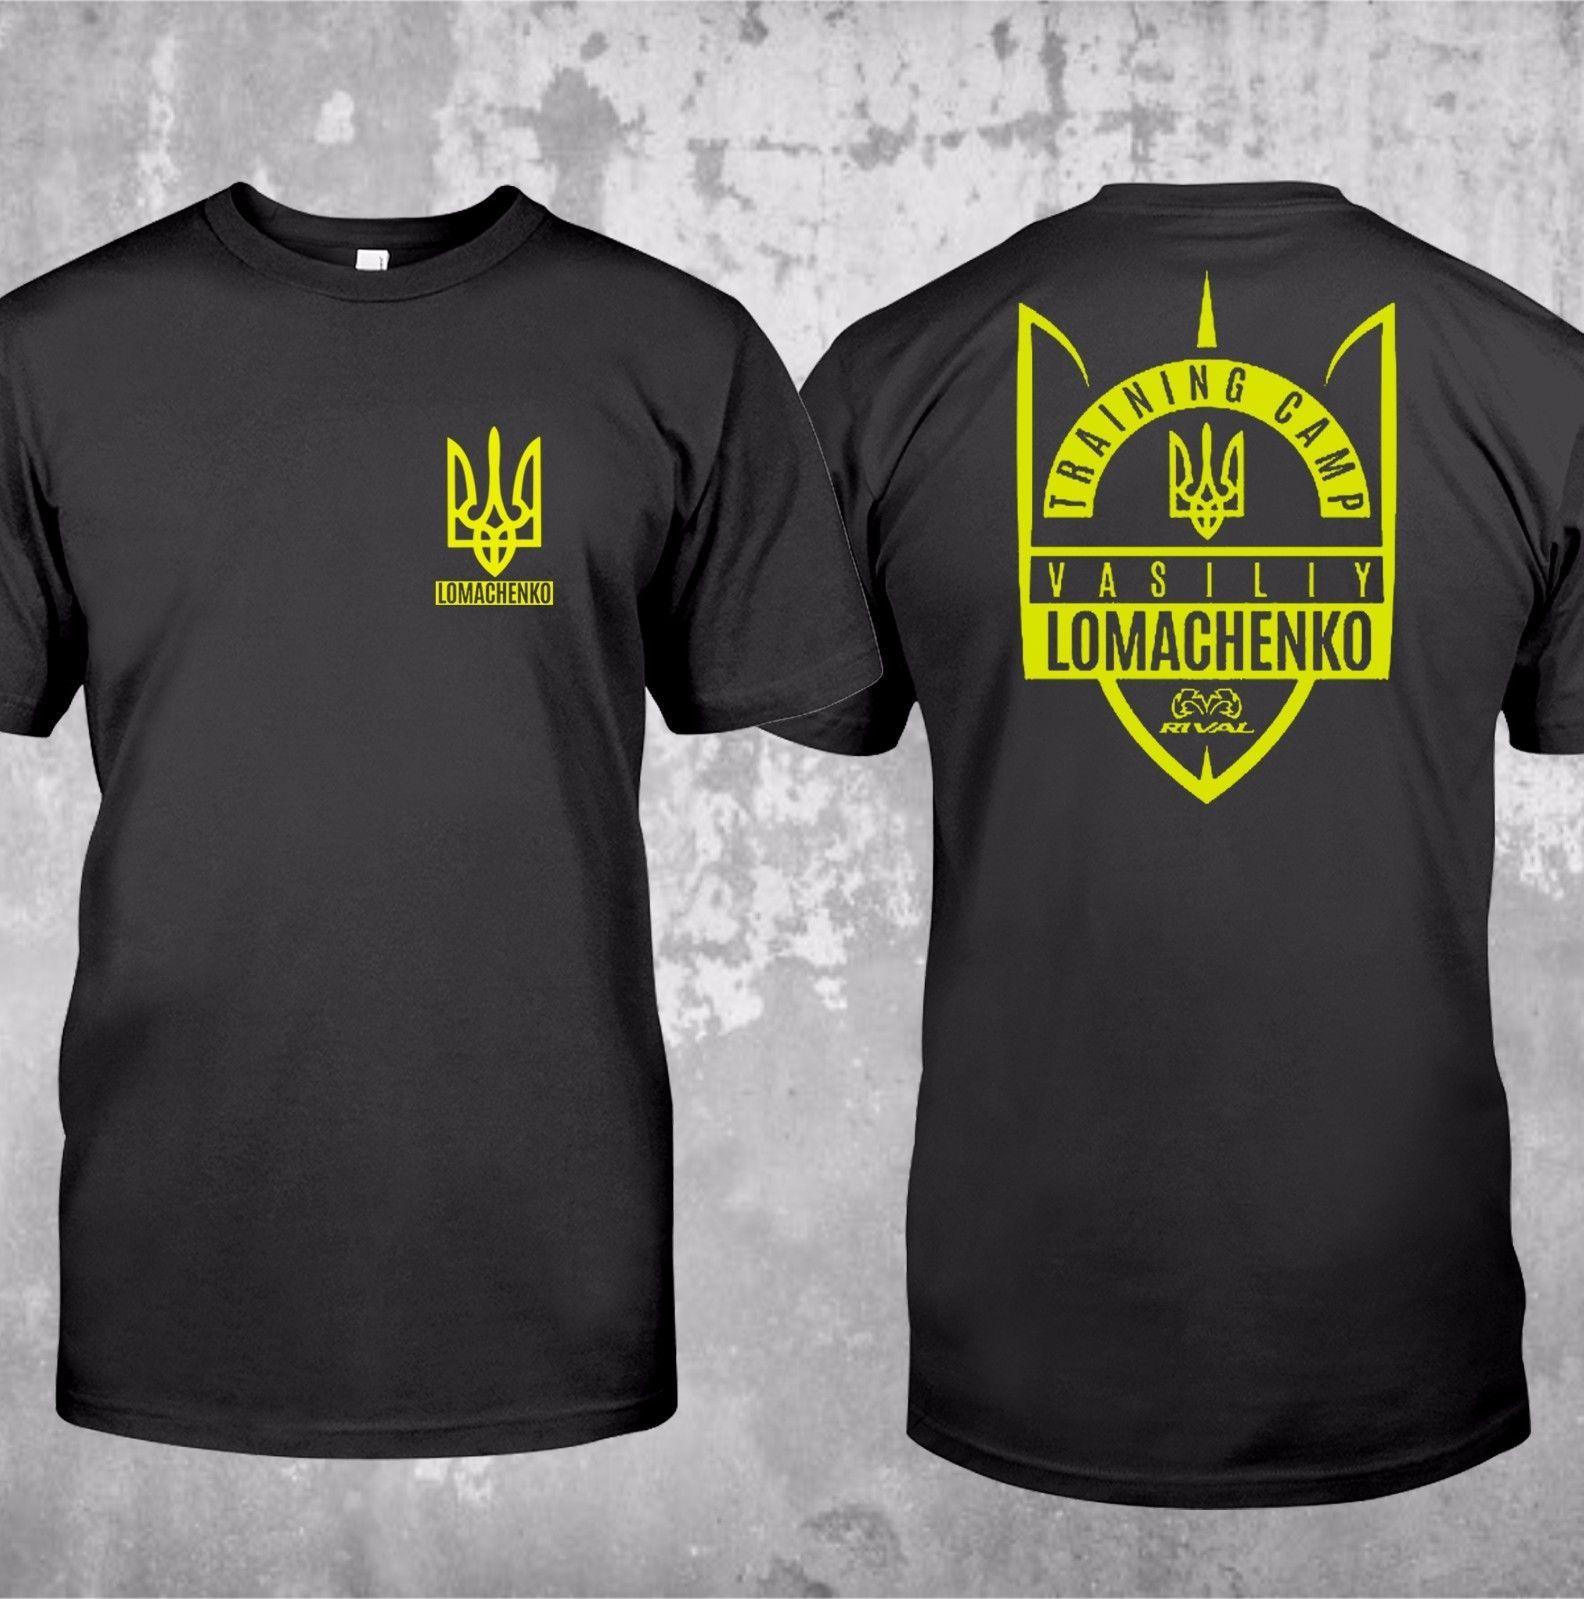 Sıcak Satış Yaz Yeni Lomachenko Ukrayna Dünya Trainer T-Shirttee Gömlek Harajuku Mens Tişörtlü Harajuku Tişört Man Yuvarlak Yaka